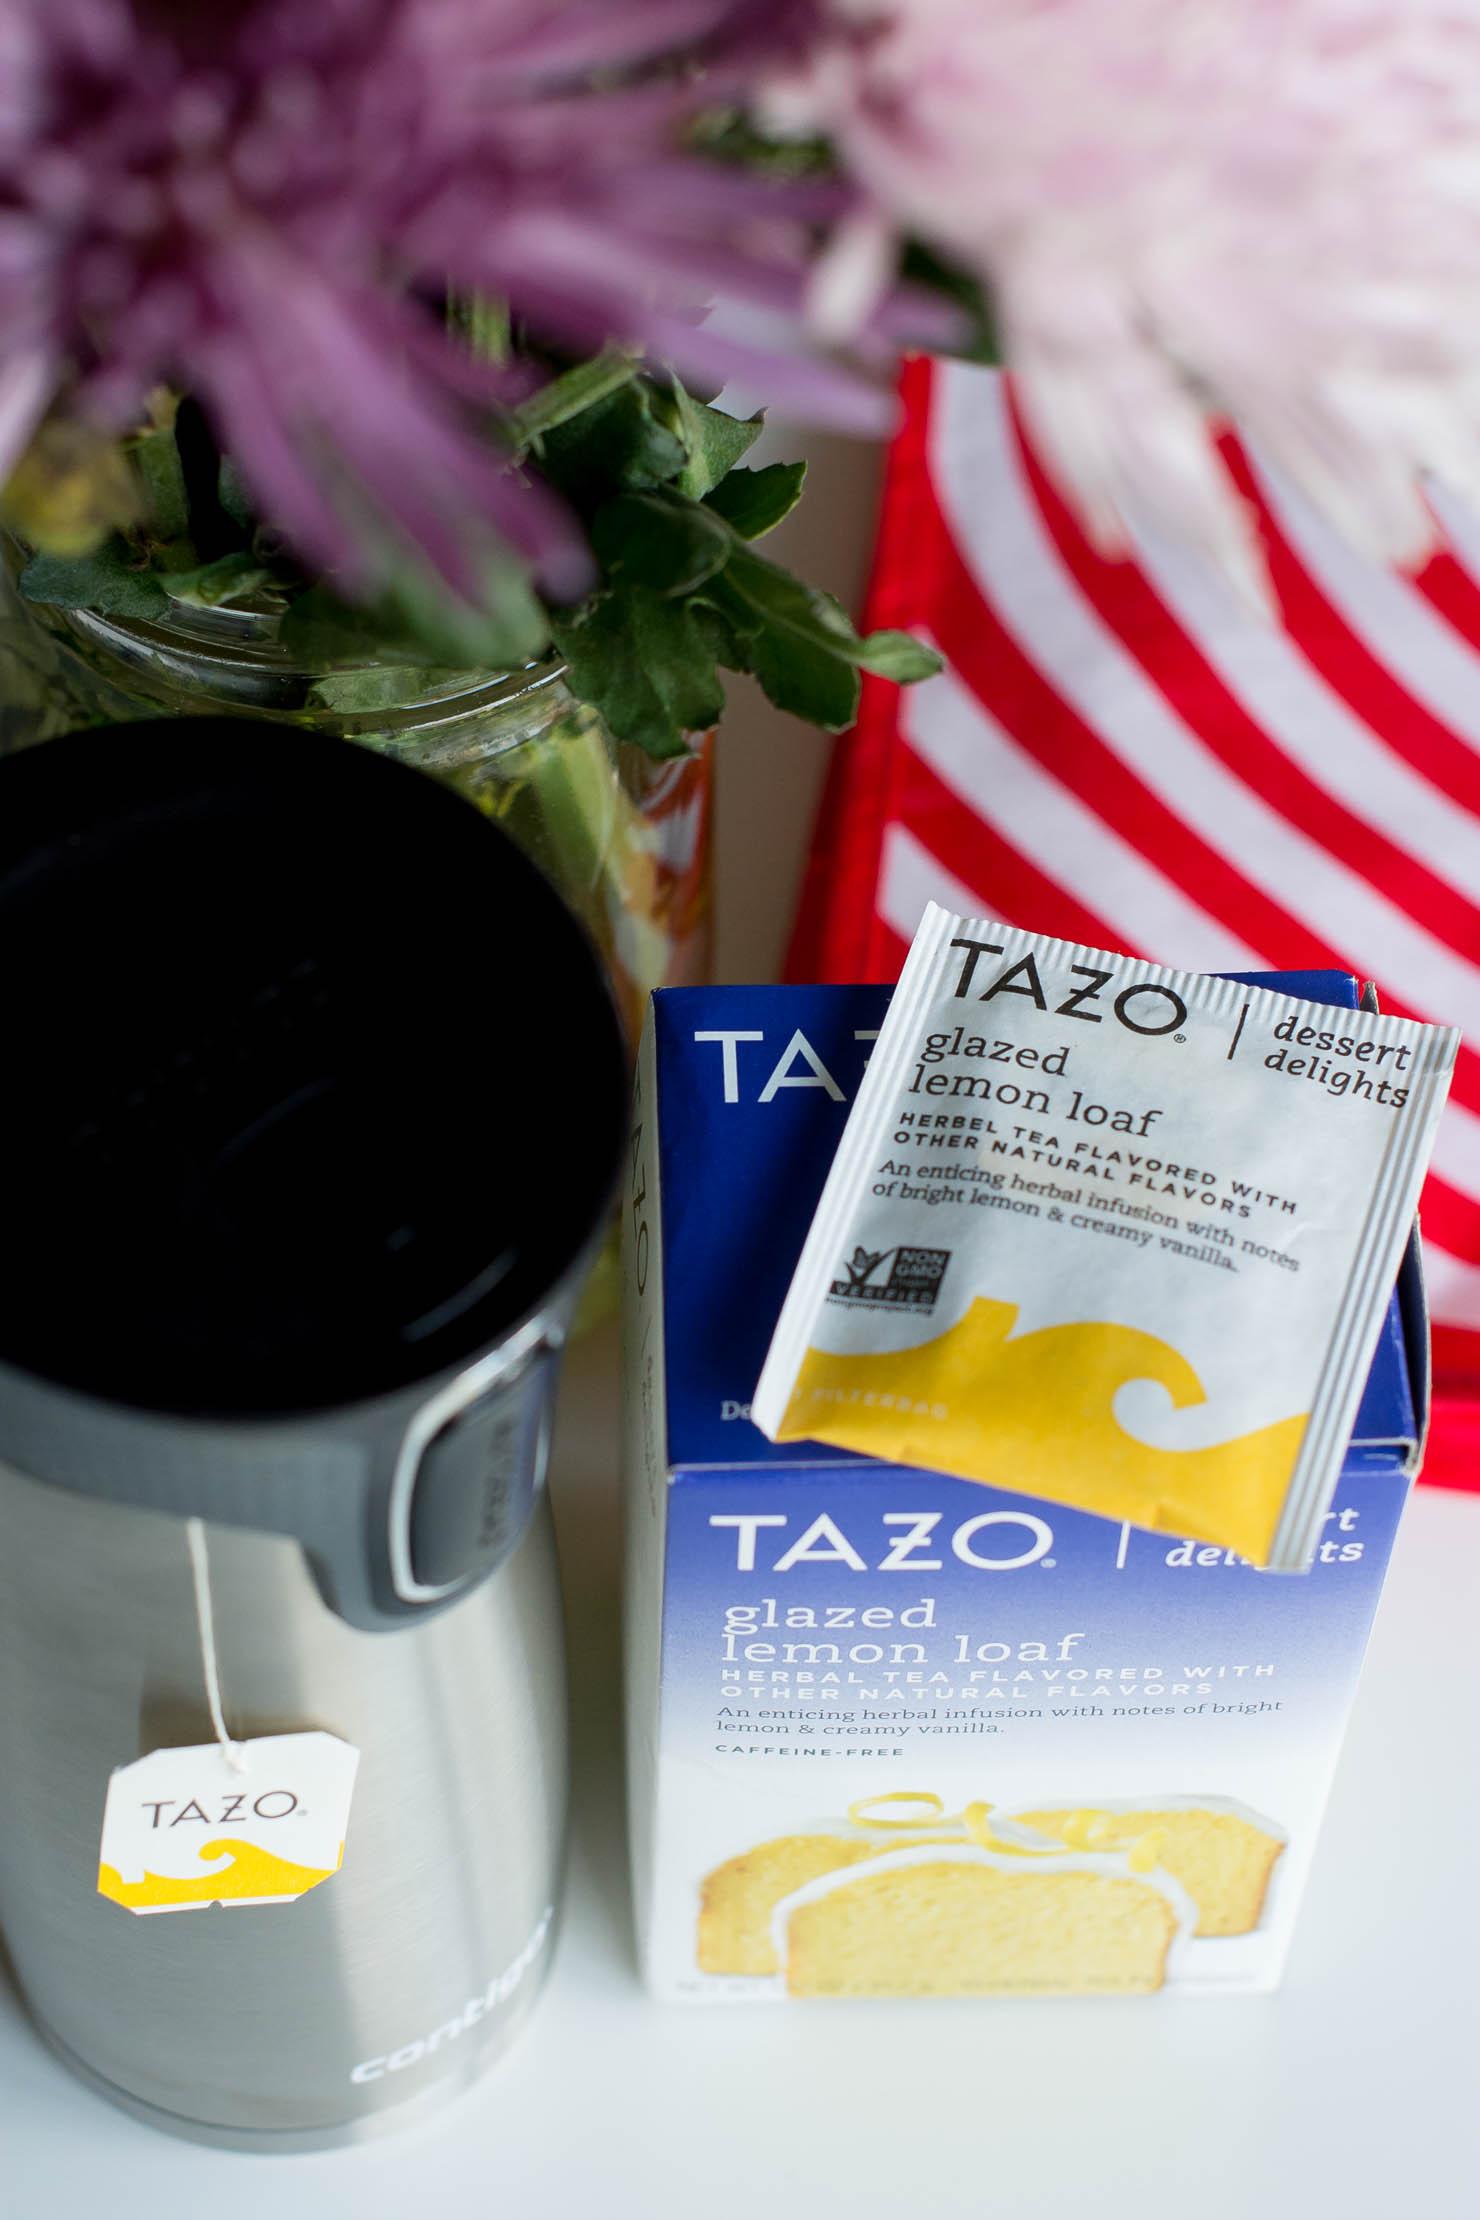 Creative gift ideas, contigo autoseal west loop travel mug, tazo dessert delight teas, how contigo and tazo teas get me through the day, getting through the day with tazo teas and contigo